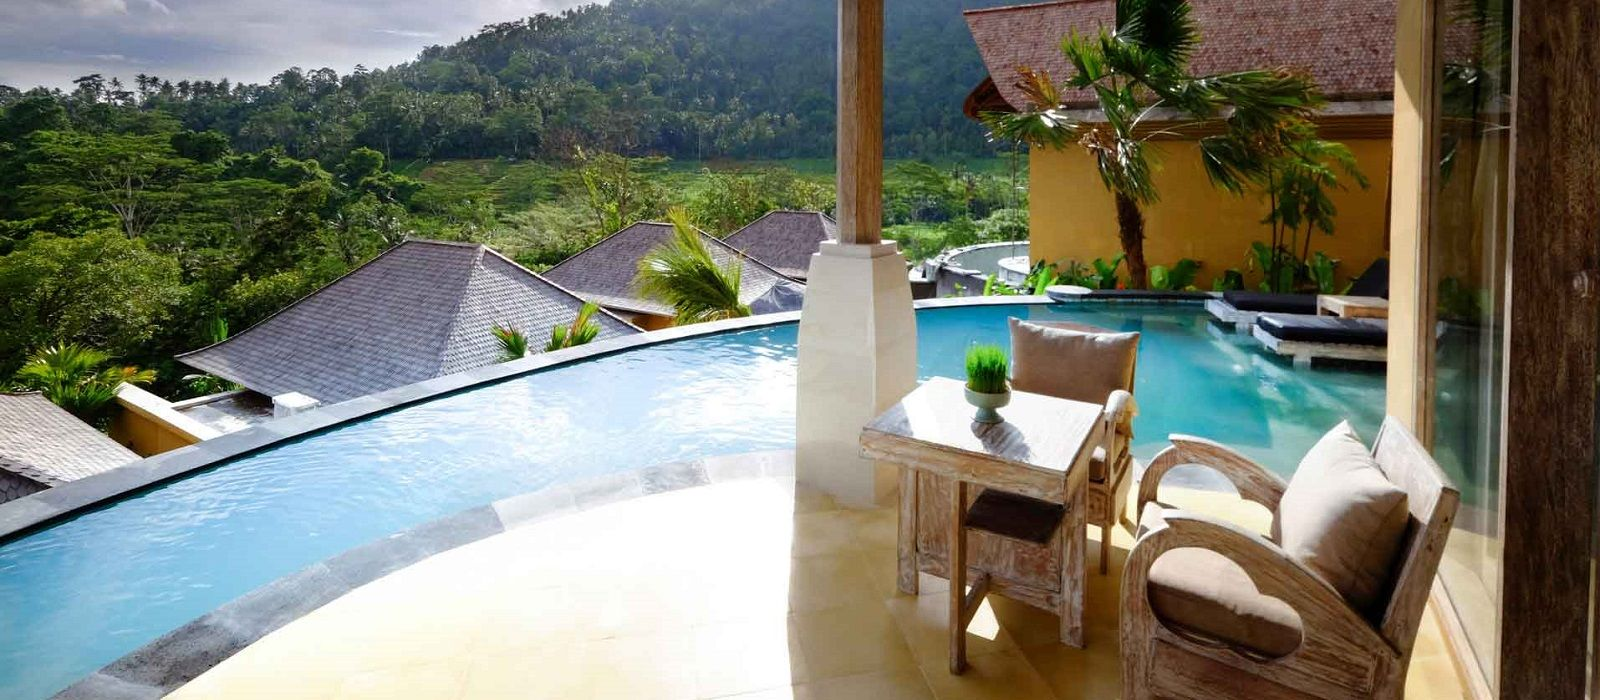 Hotel Wapa di Ume, Sideman Indonesia